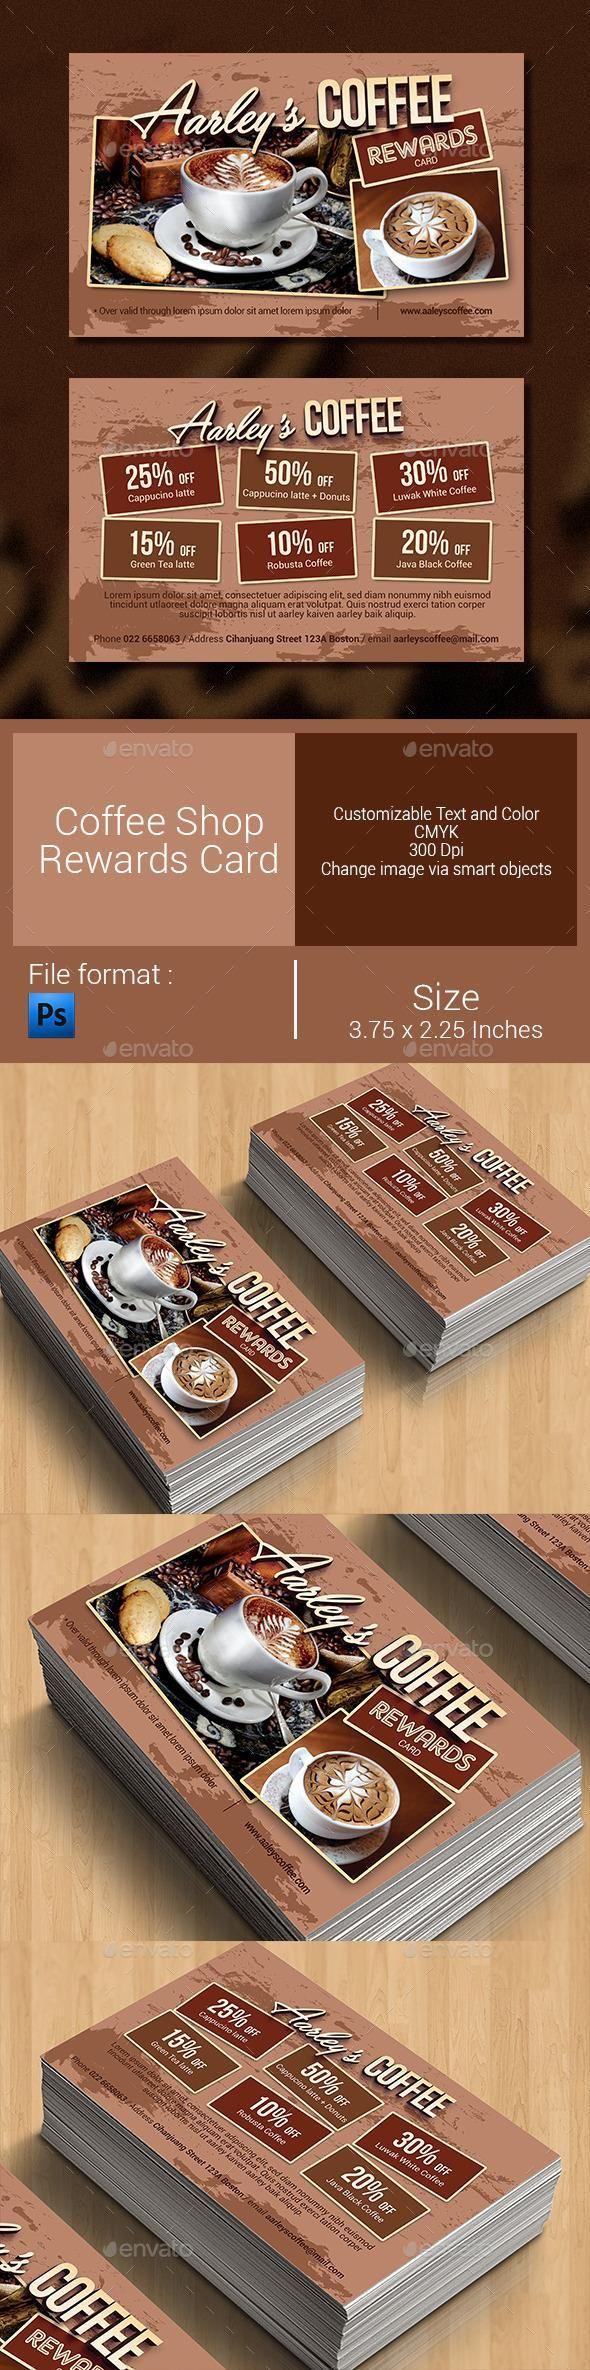 Coffee Shop Rewards Card  #template #cards #print #invites